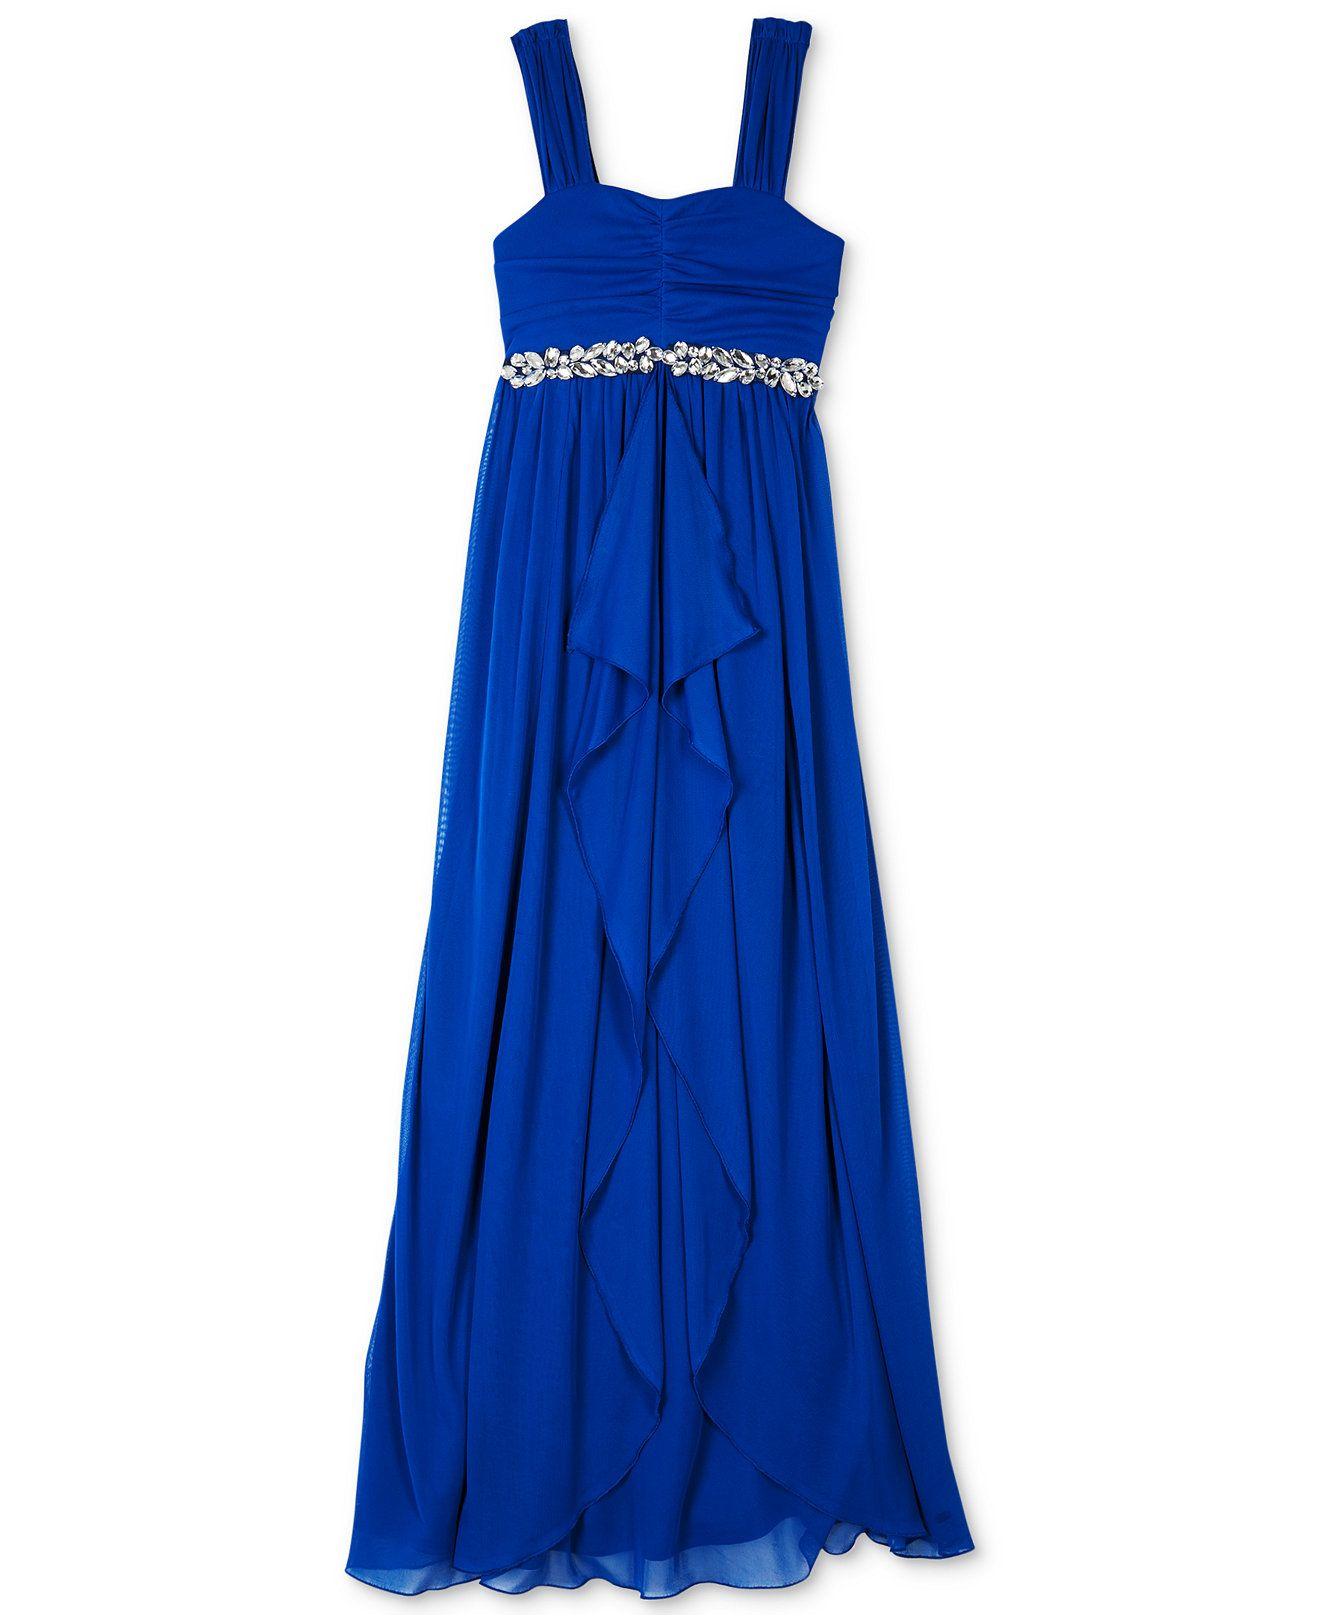 For phoebe bcx girlsu jeweled maxi dress kids girls macyus